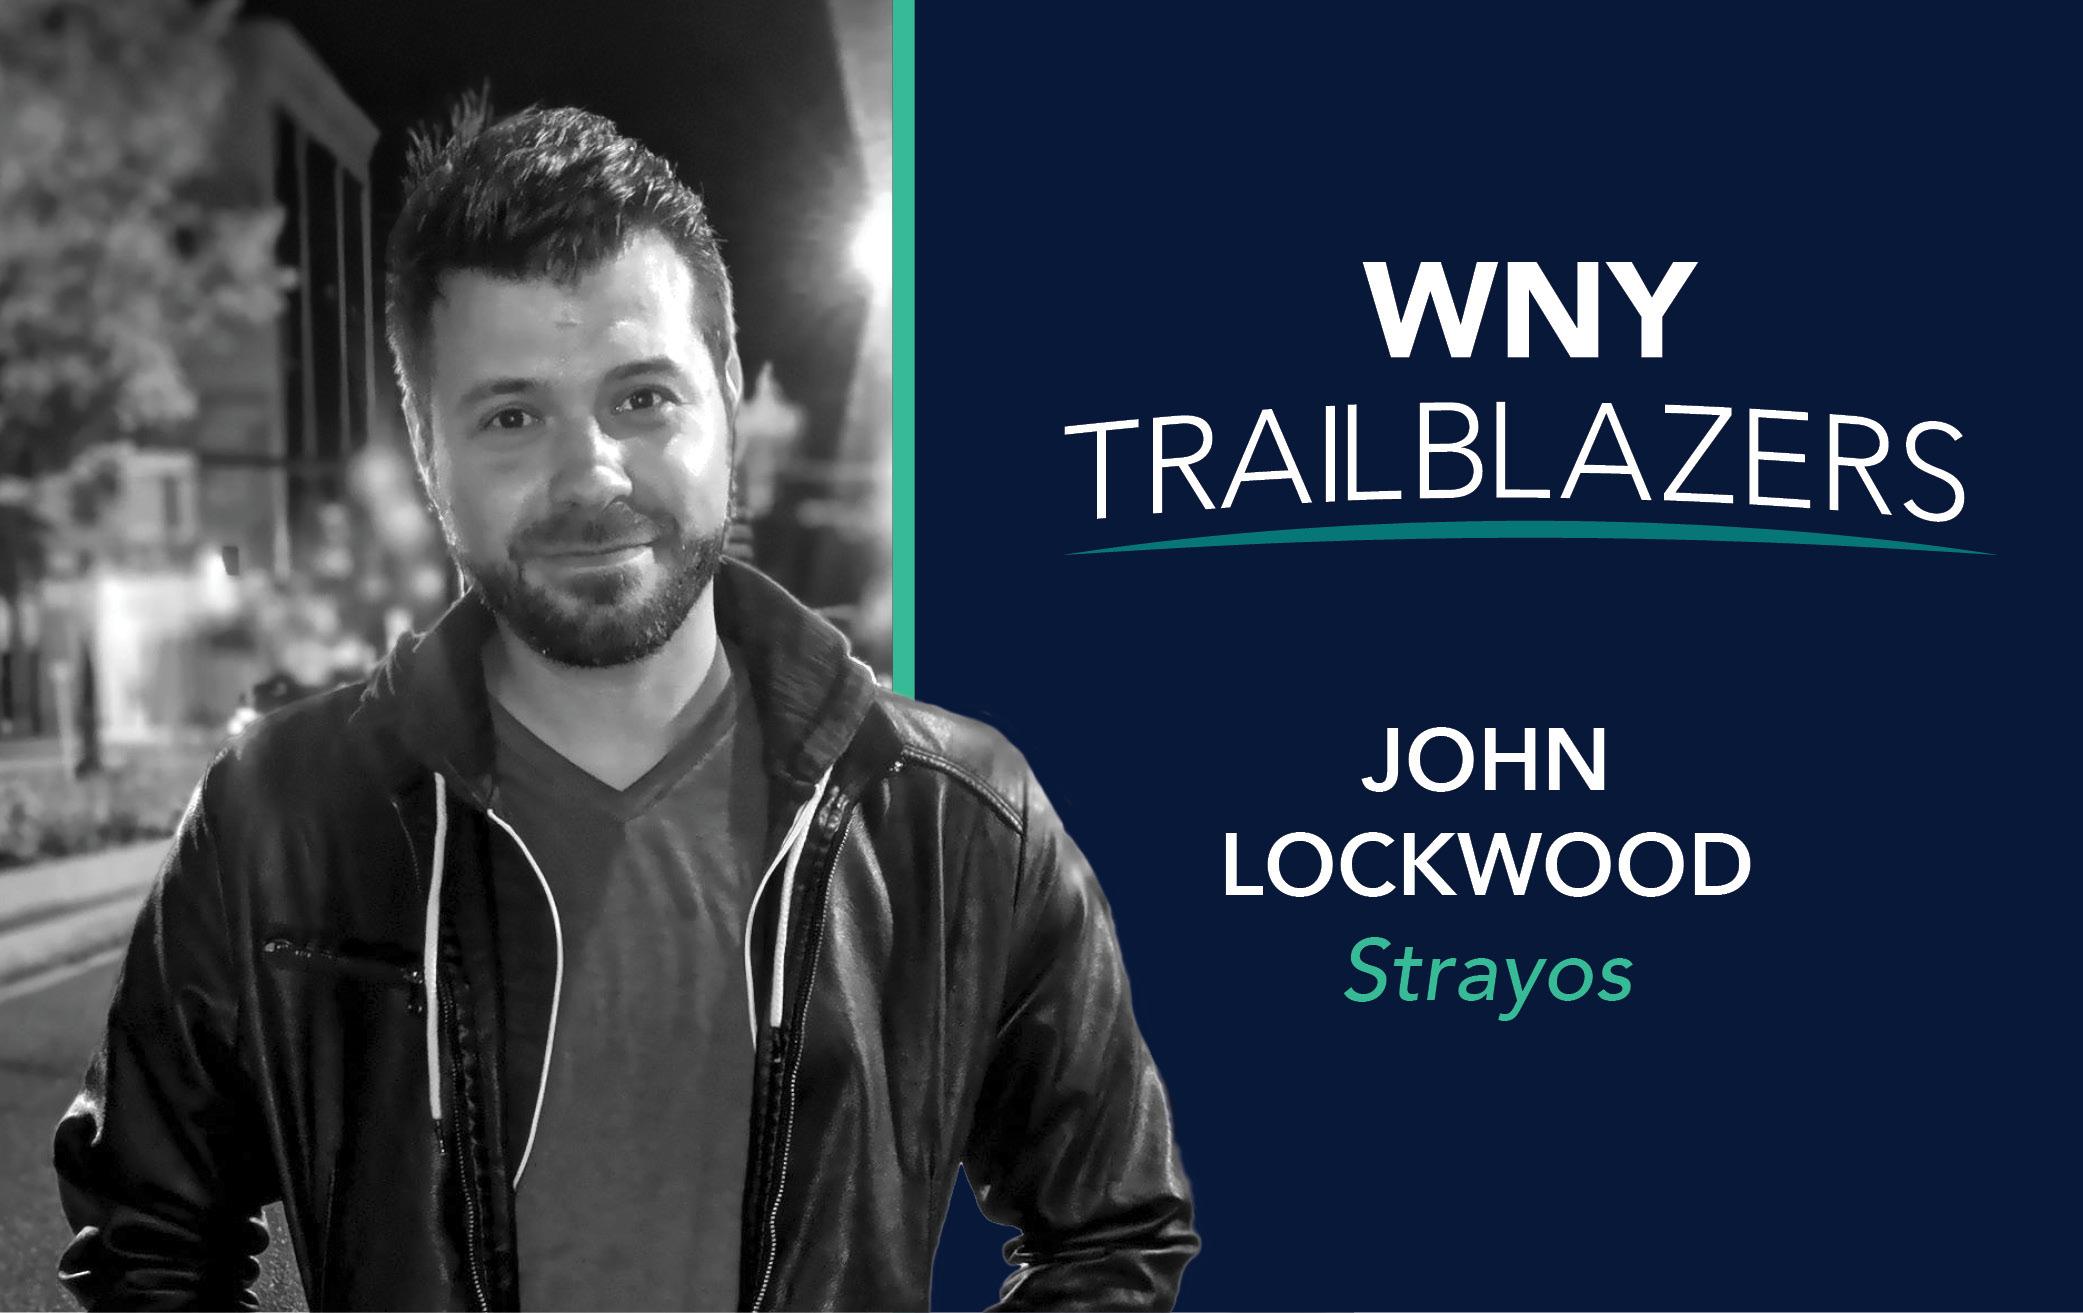 Western New York Trailblazer: John Lockwood, Strayos